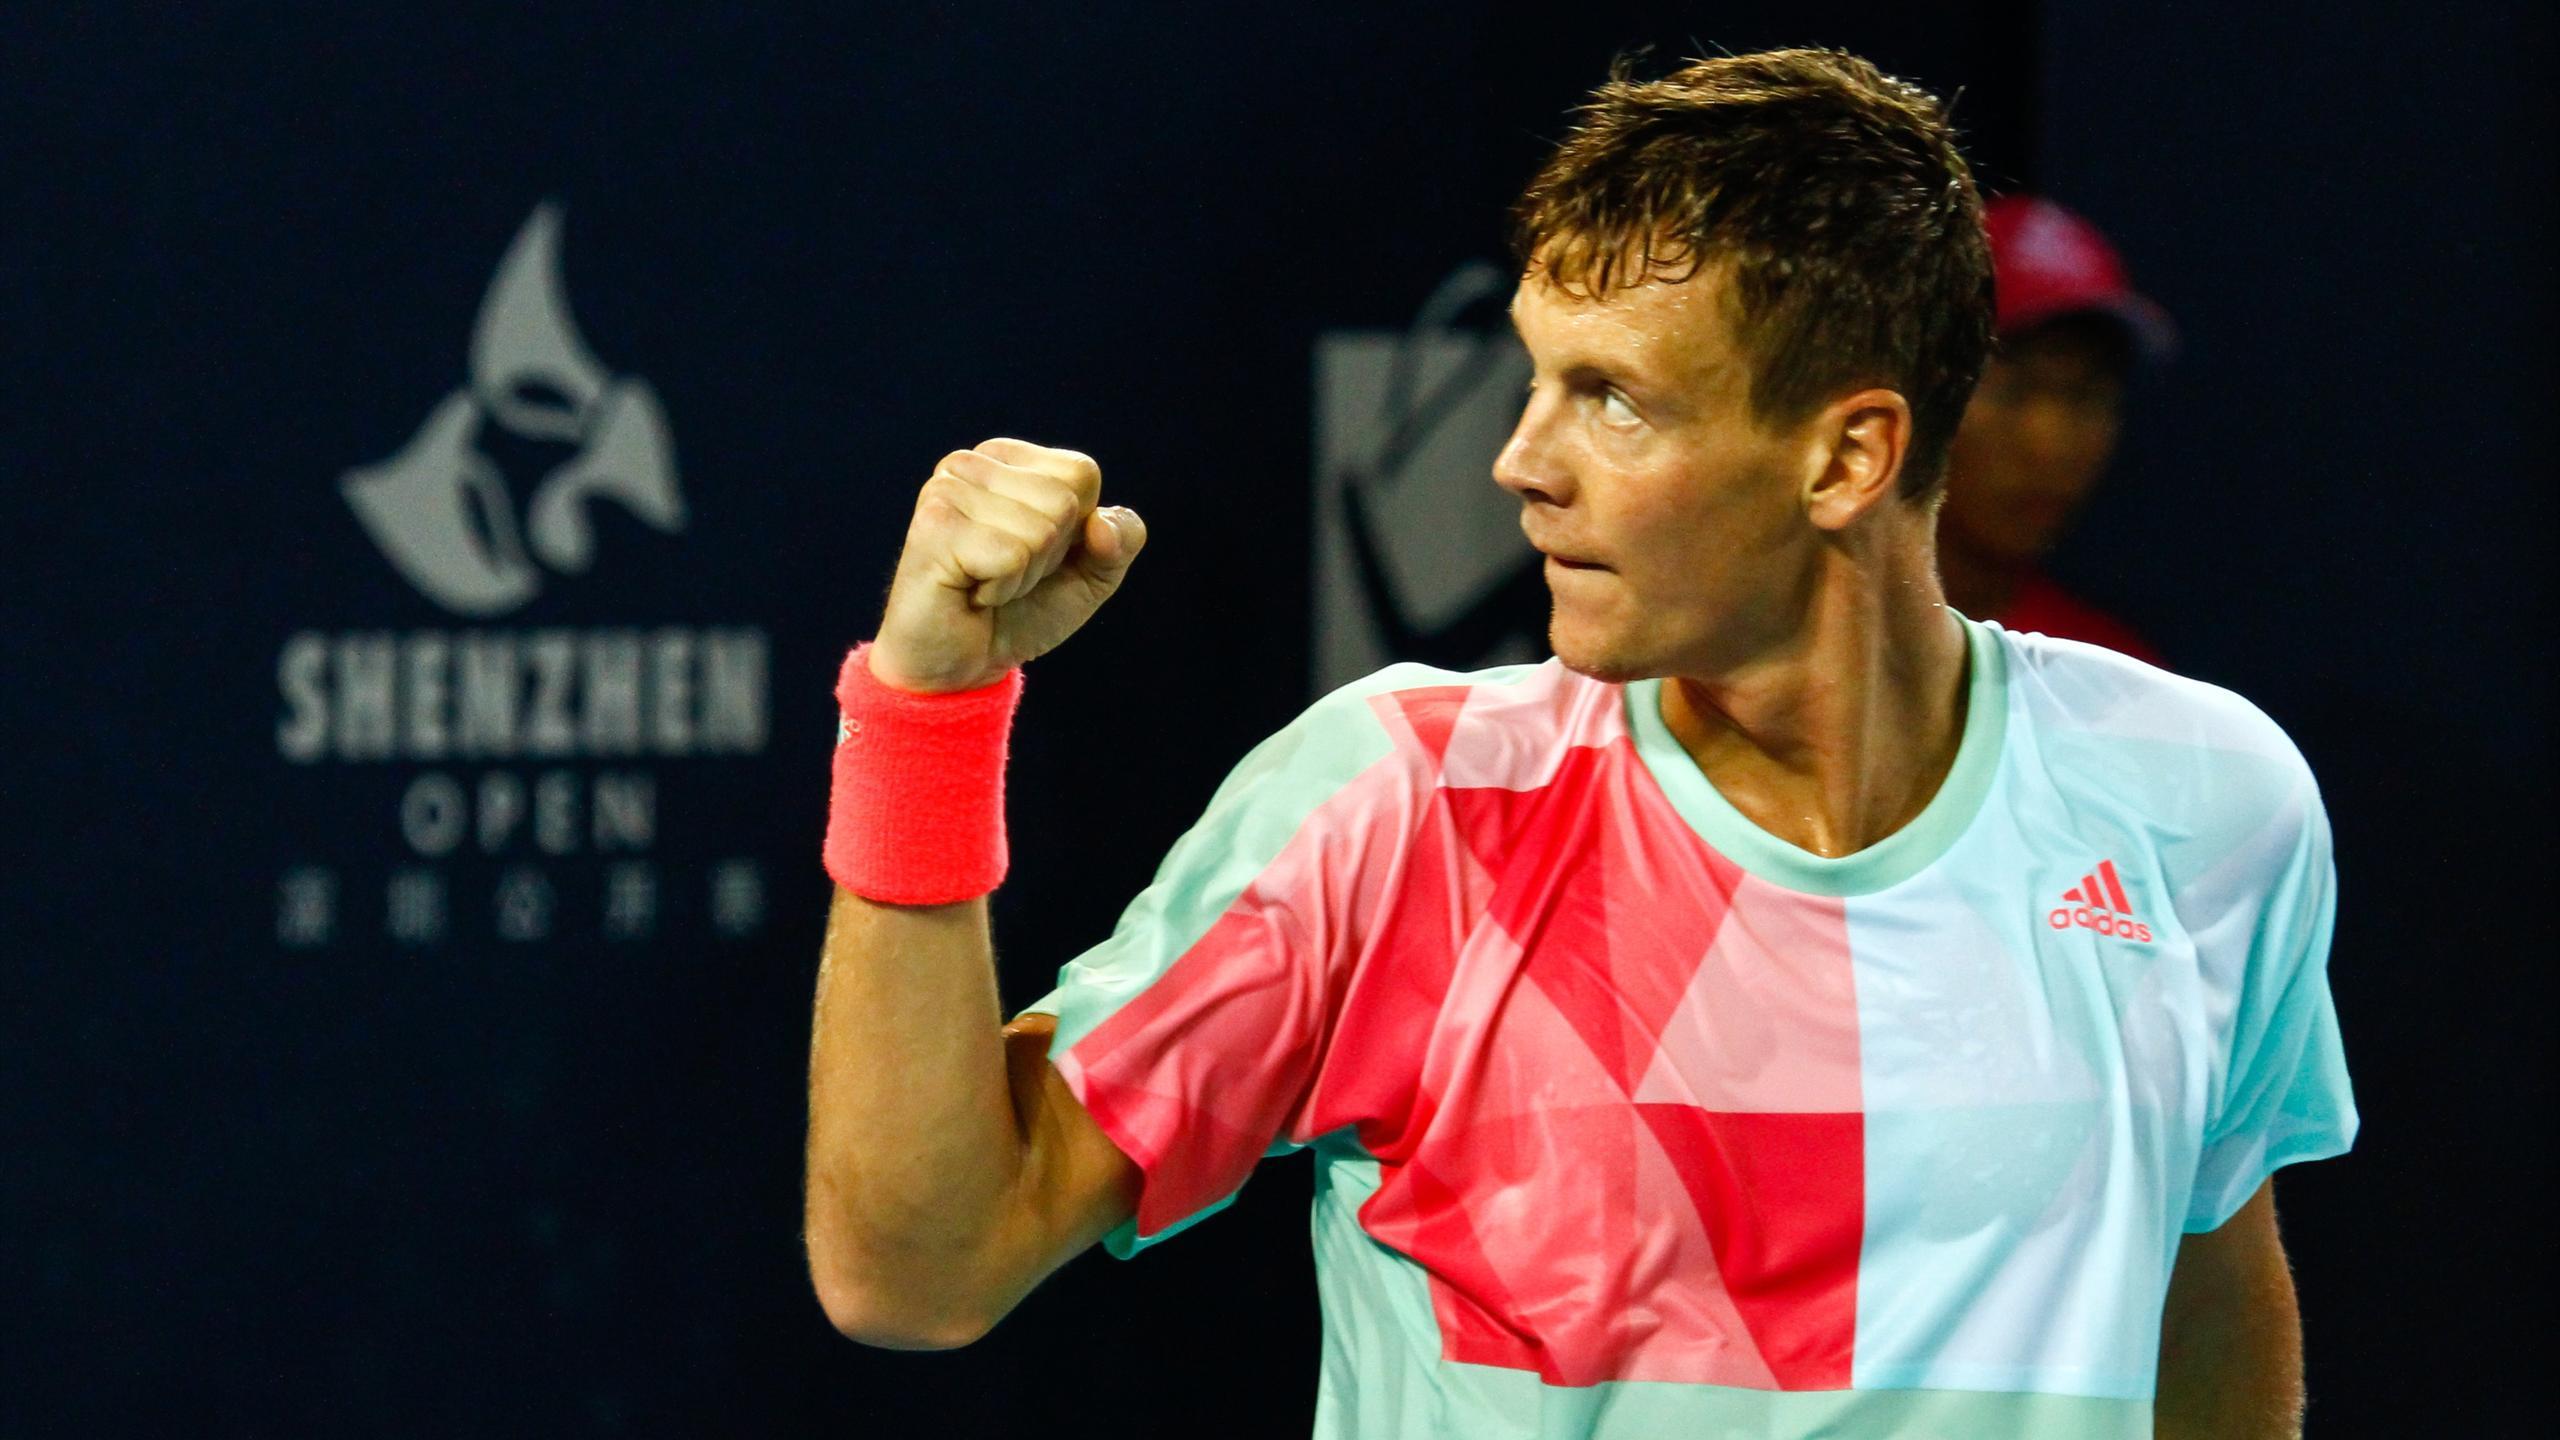 Tomas Berdych of Czech Republic celebrates after winning the Shenzhen Open